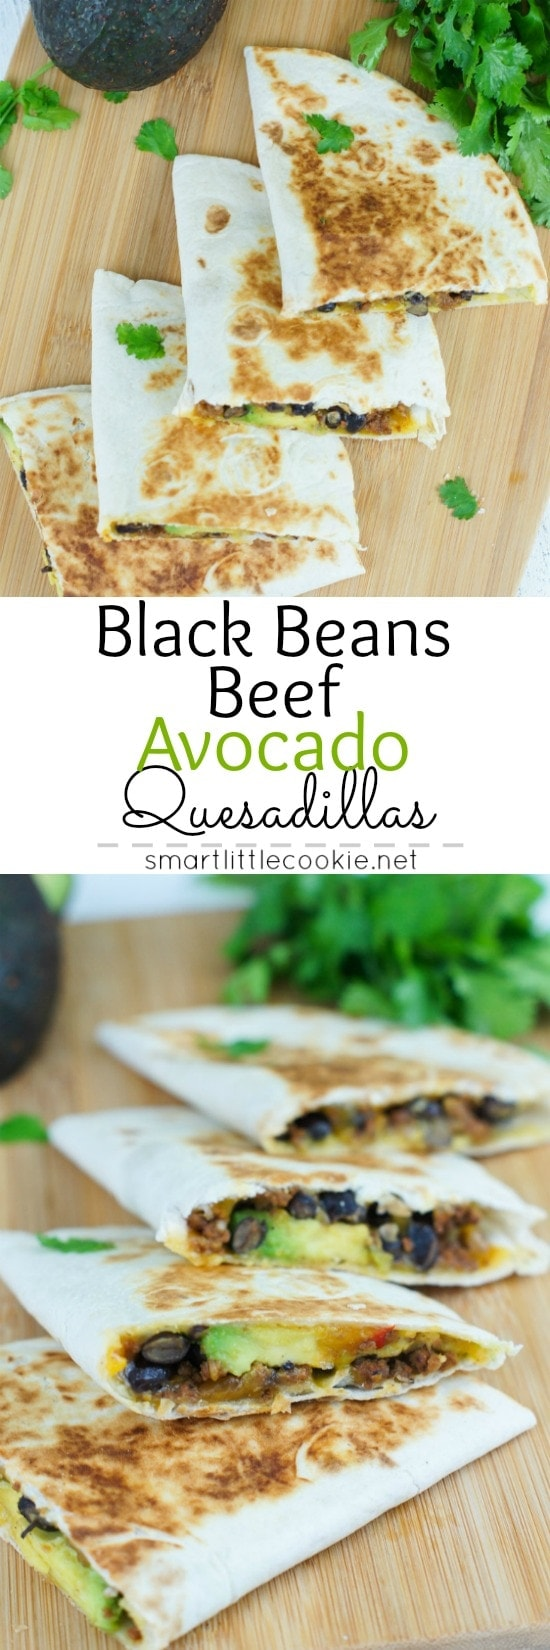 Black Beans Beef and Avocado Quesadillas 10